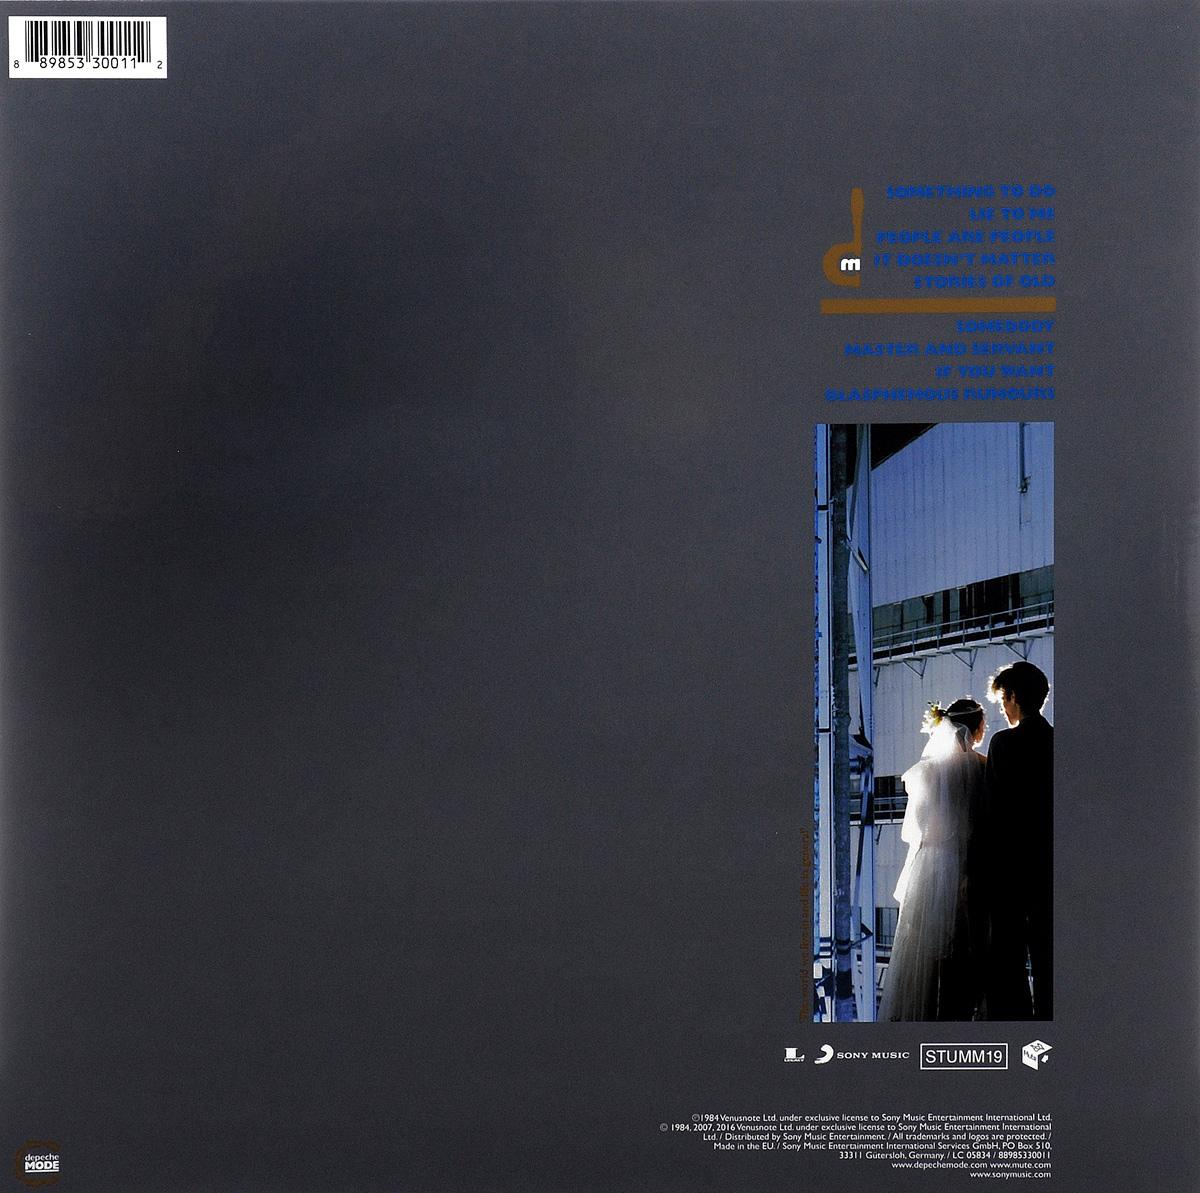 Depeche Mode.  Some Great Reward (LP) Sony Music Entertainment, Inc.,Warner Music